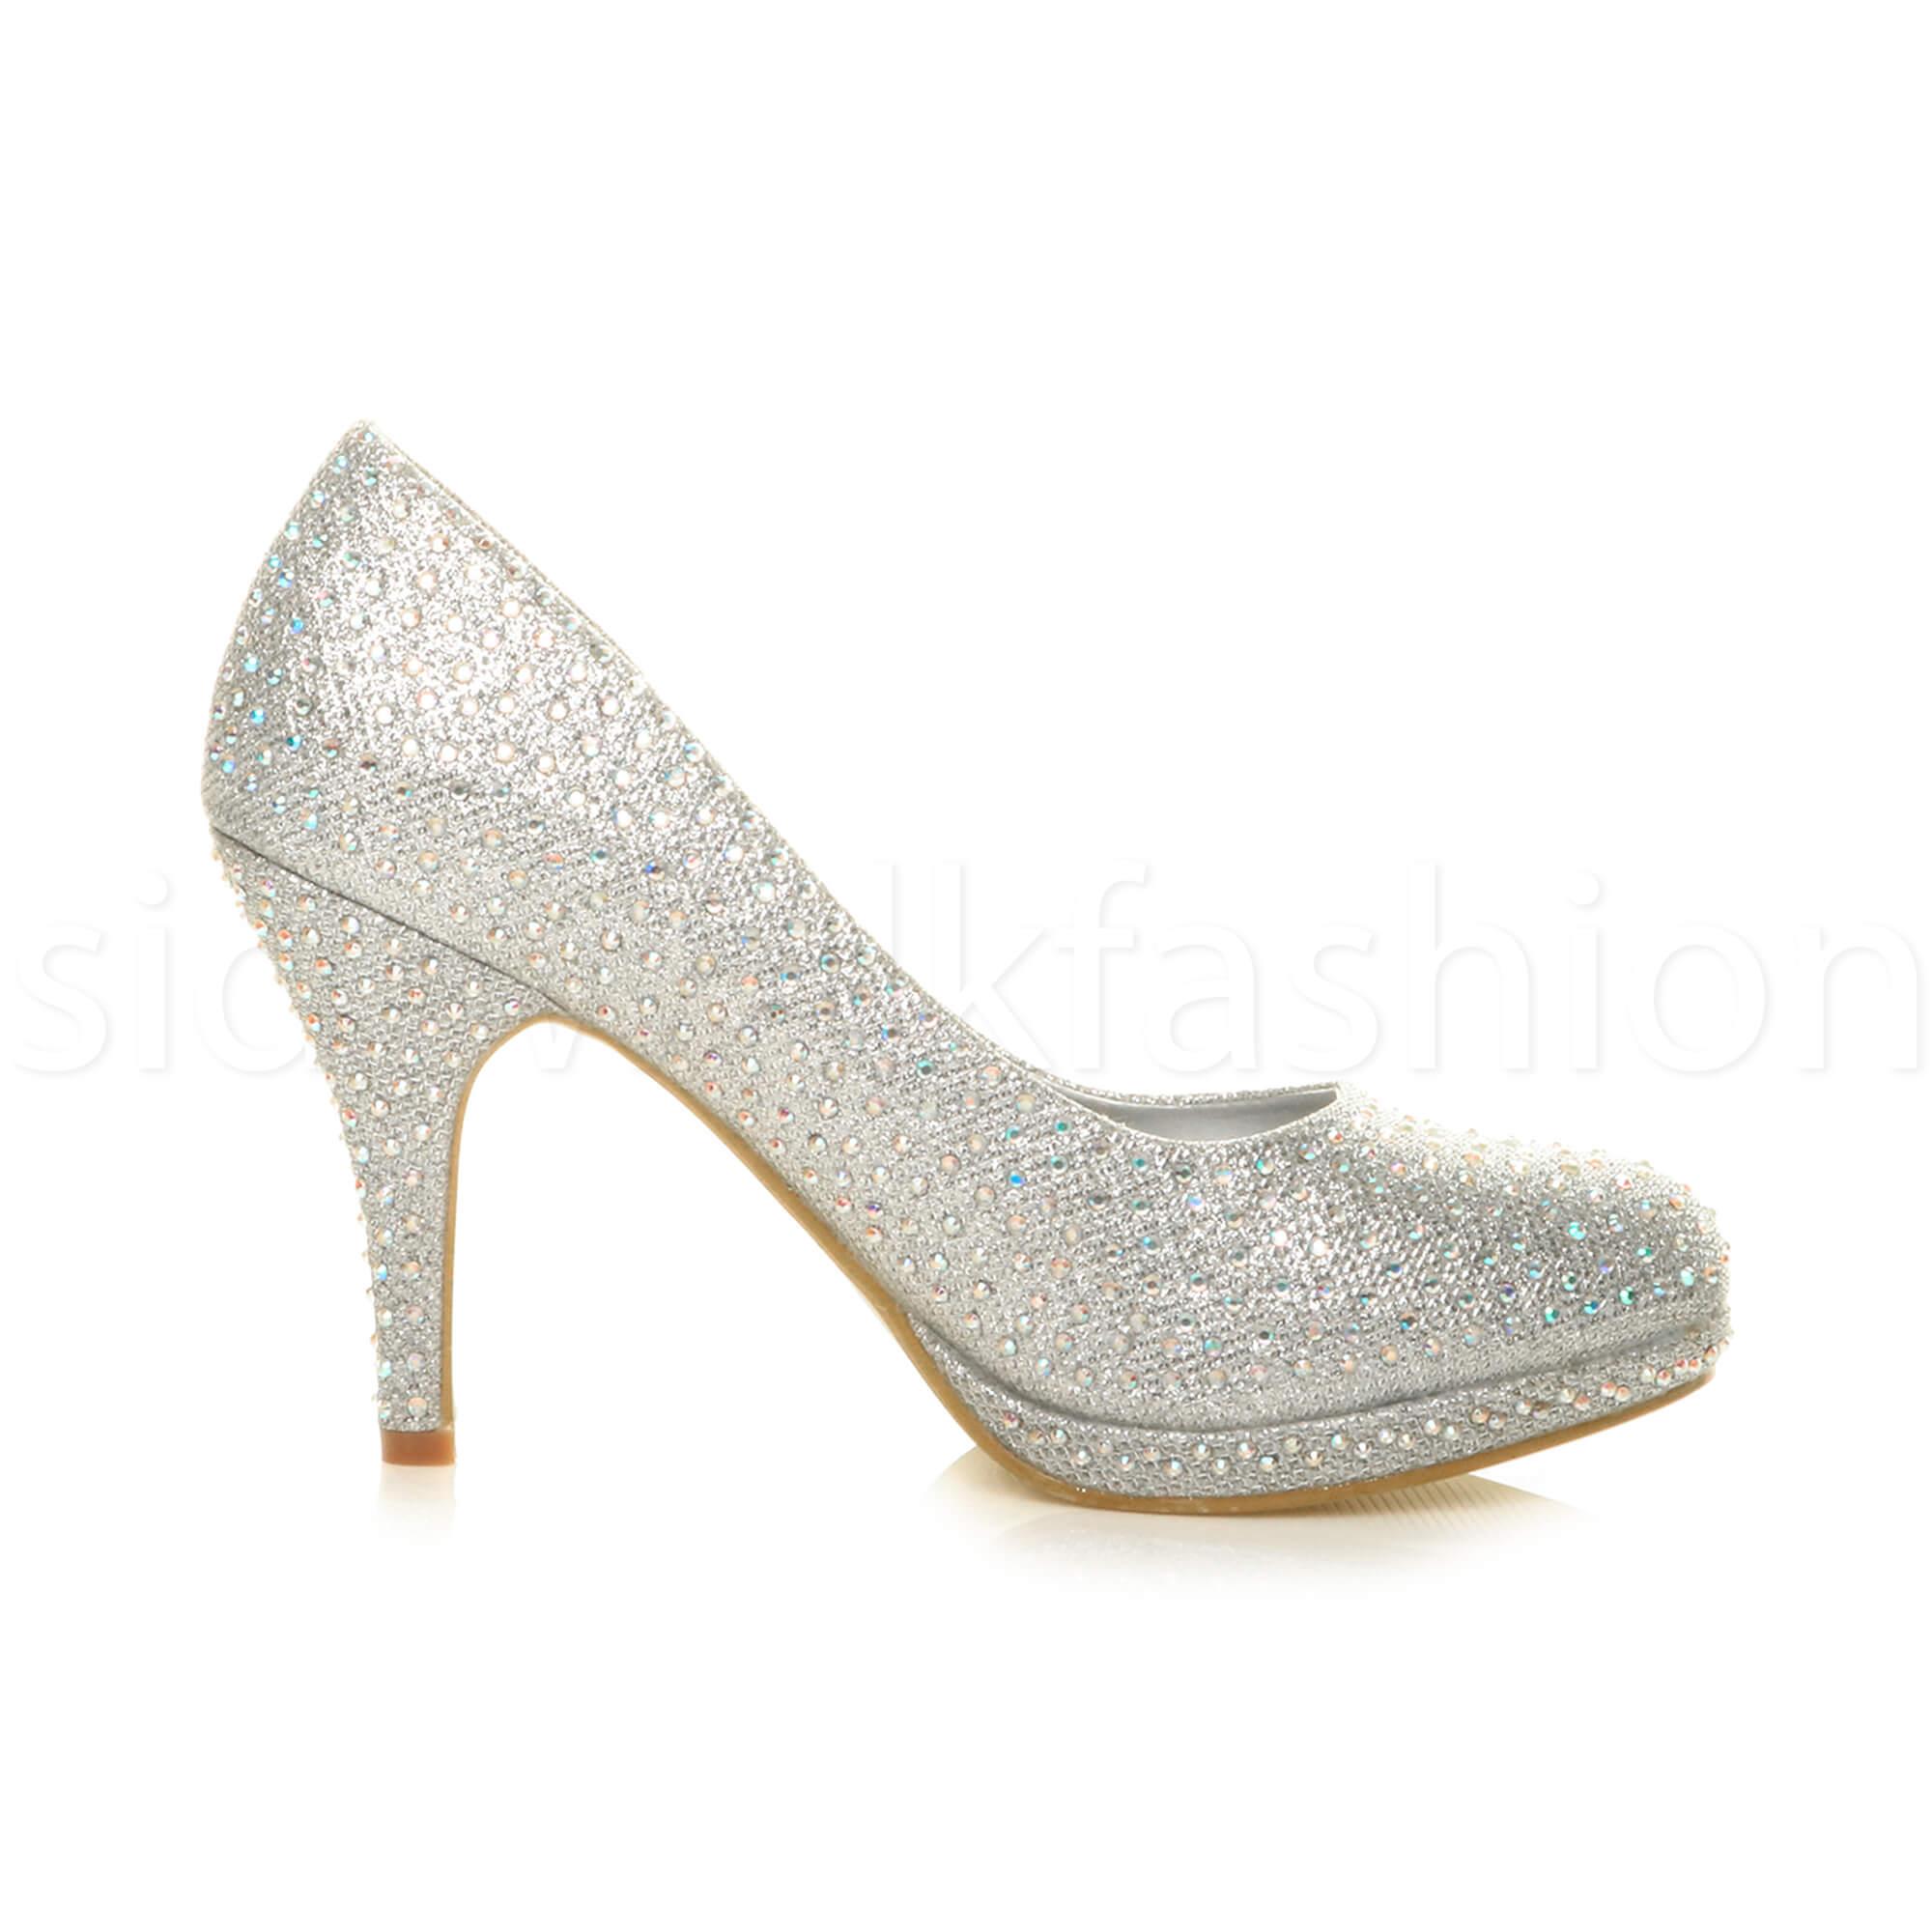 Womens-ladies-high-mid-heel-platform-wedding-evening-bridesmaid-court-shoes-size thumbnail 179